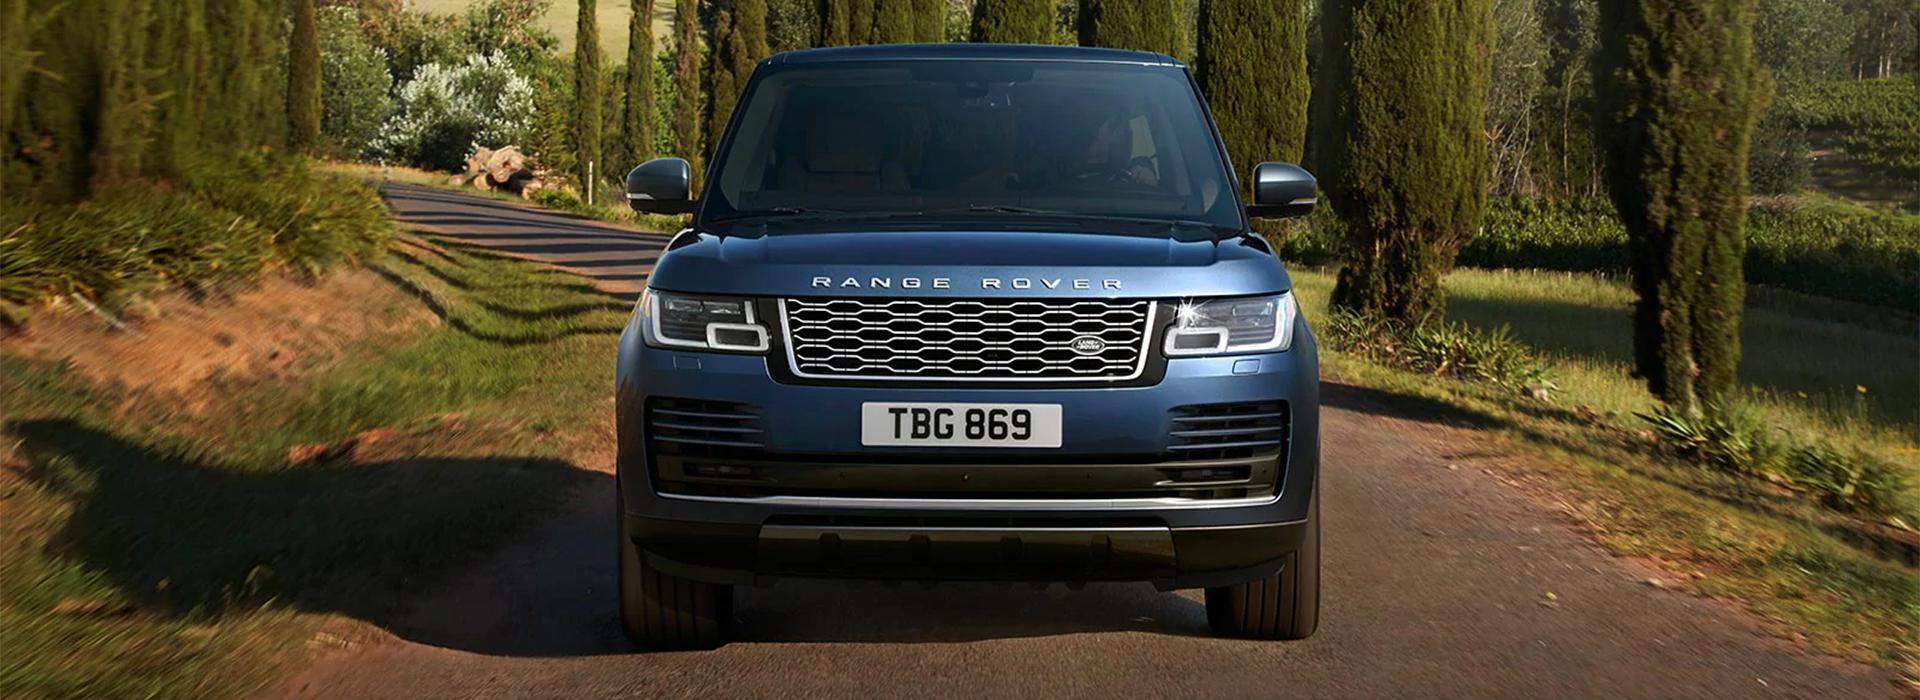 Range Rover Hero